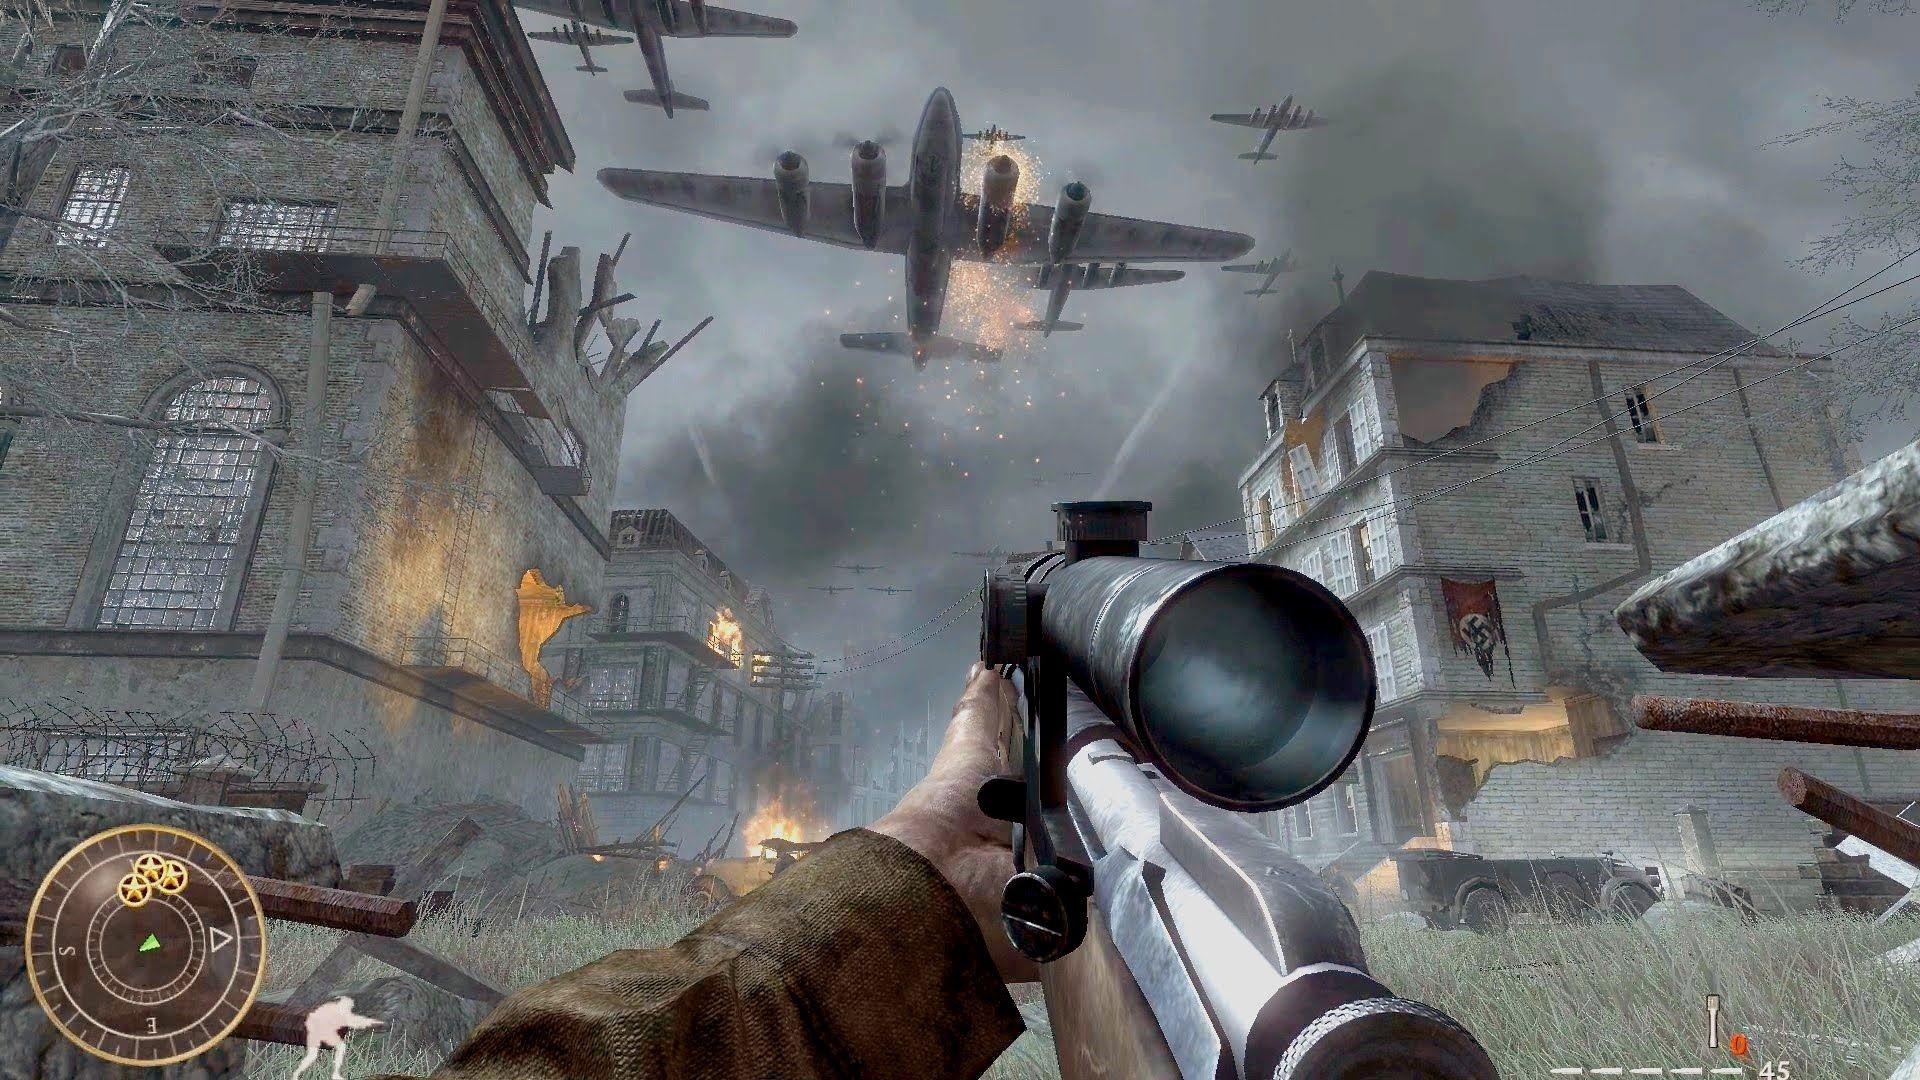 Call Of Duty World At War Vendetta Brutal Sniper Mission Gameplay Call Of Duty World Call Of Duty Call Of Duty Warfare